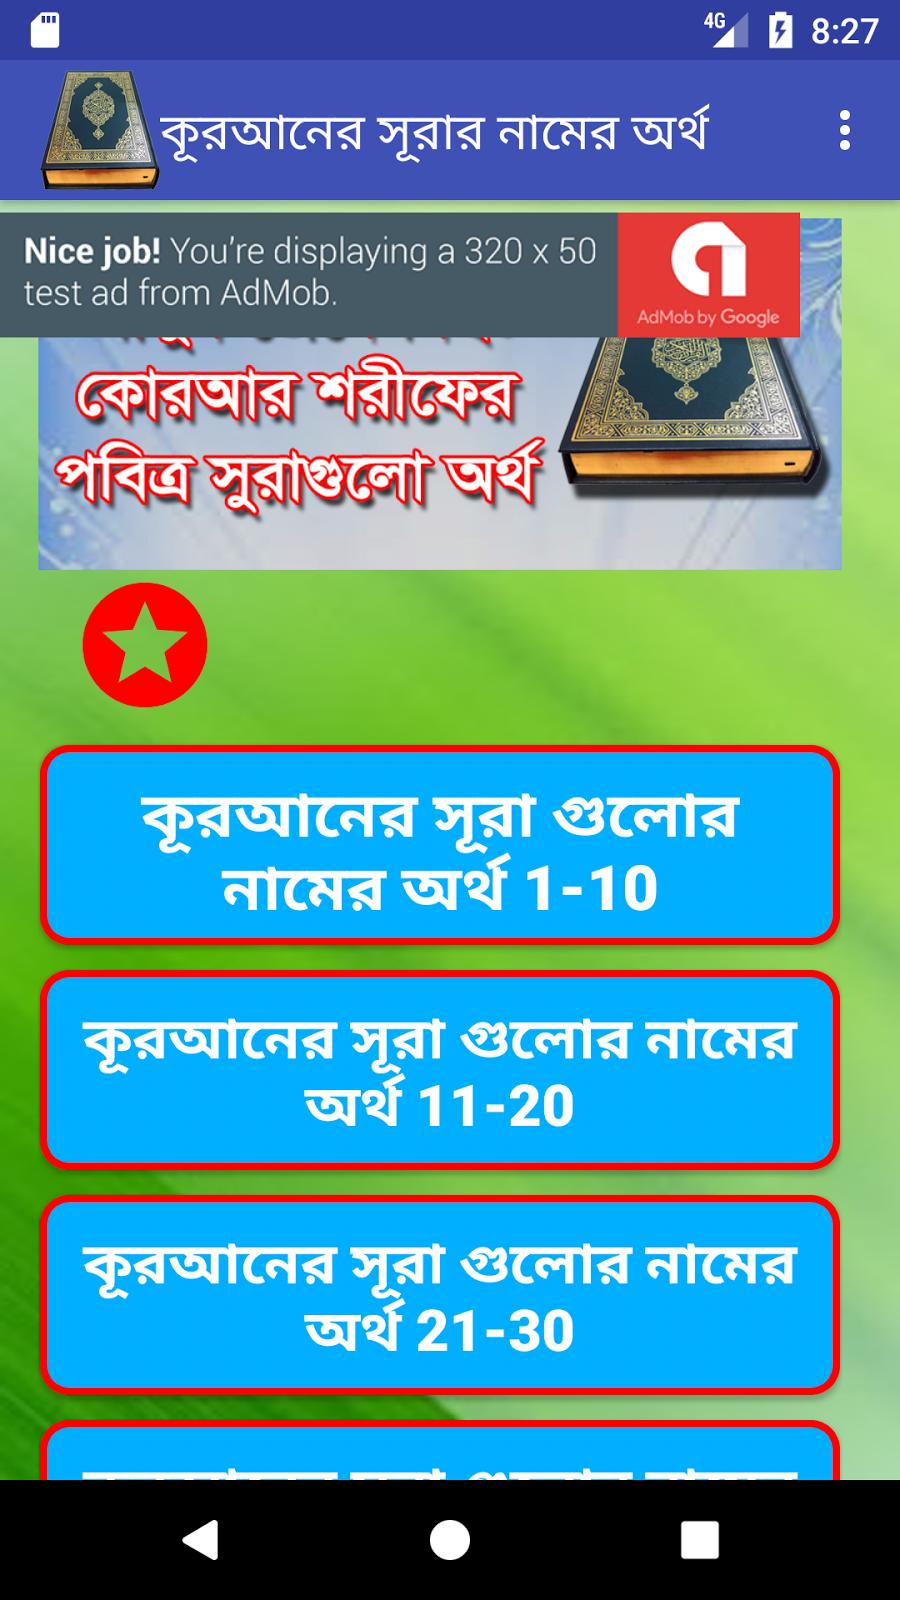 milonbd03: Al-Quran 114 Surah Names Bangla Meaning [বাংলা]